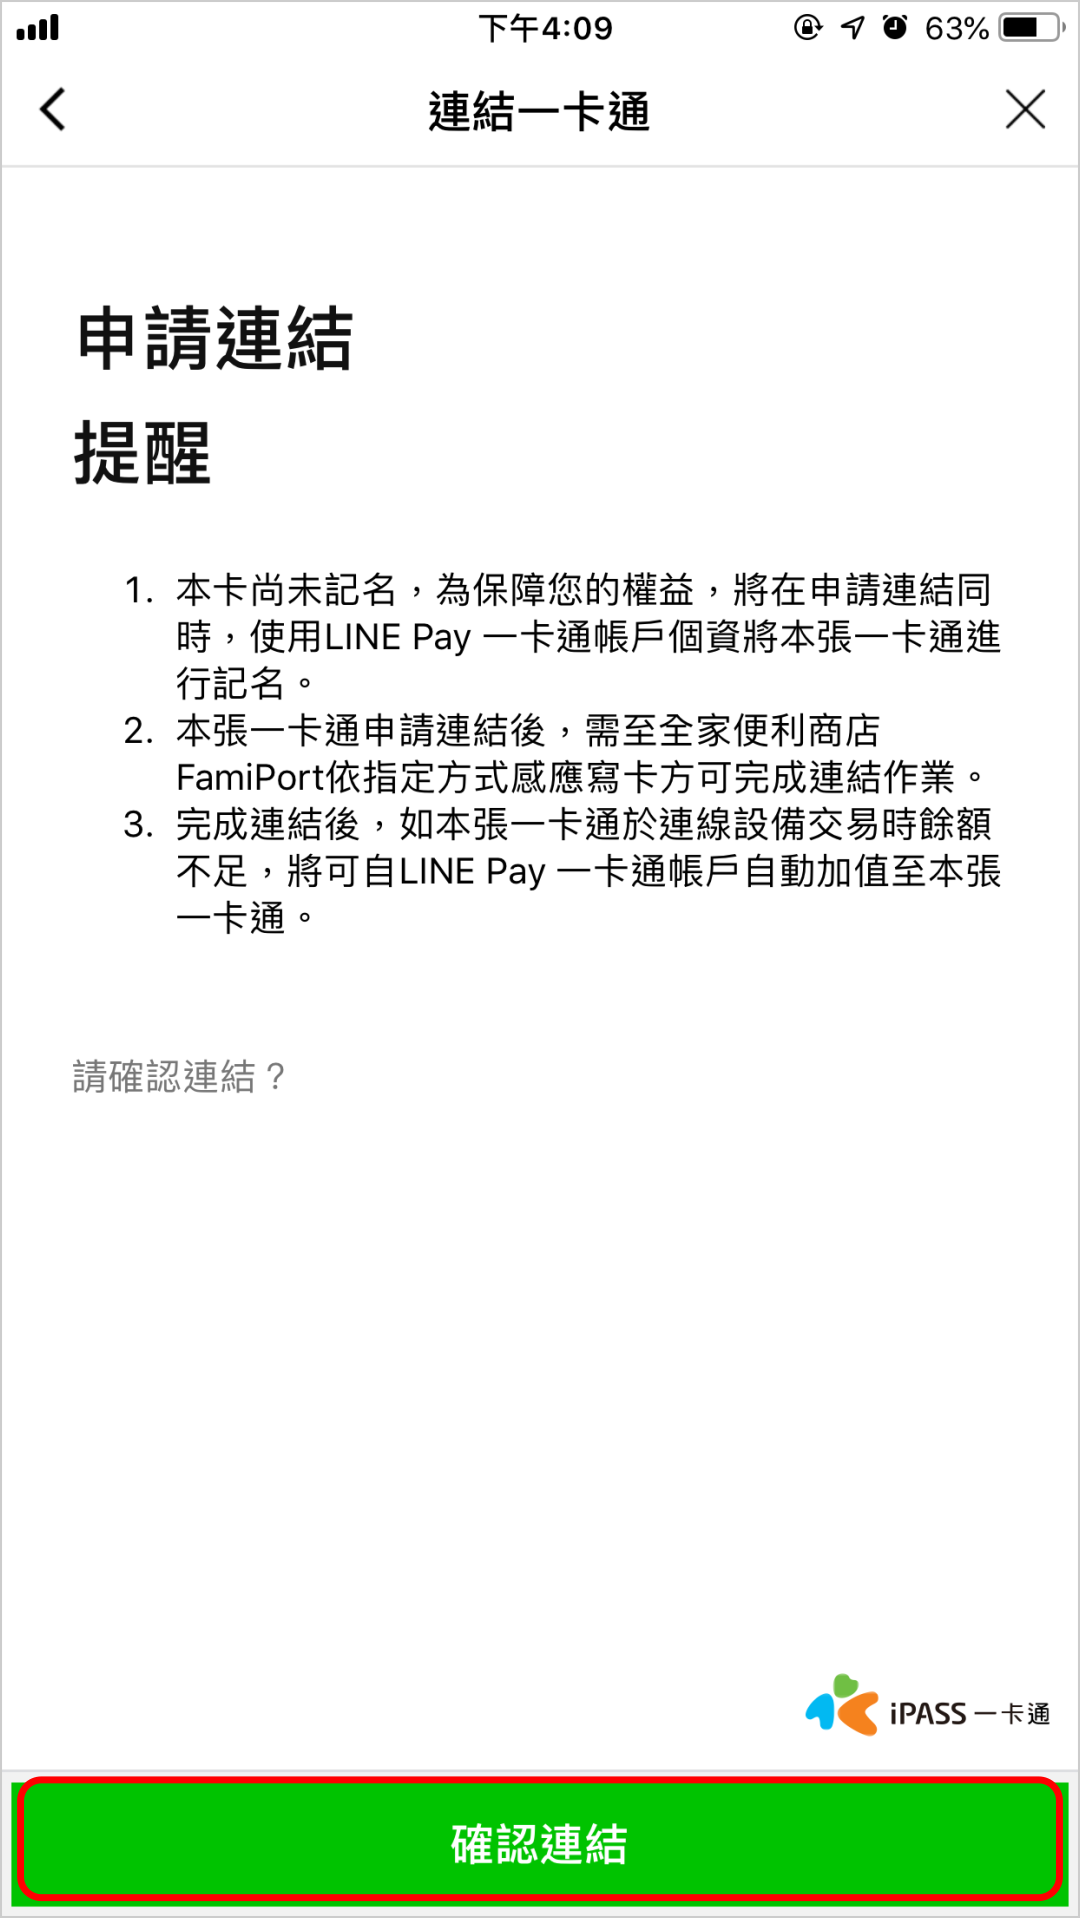 超商 LINE PAY